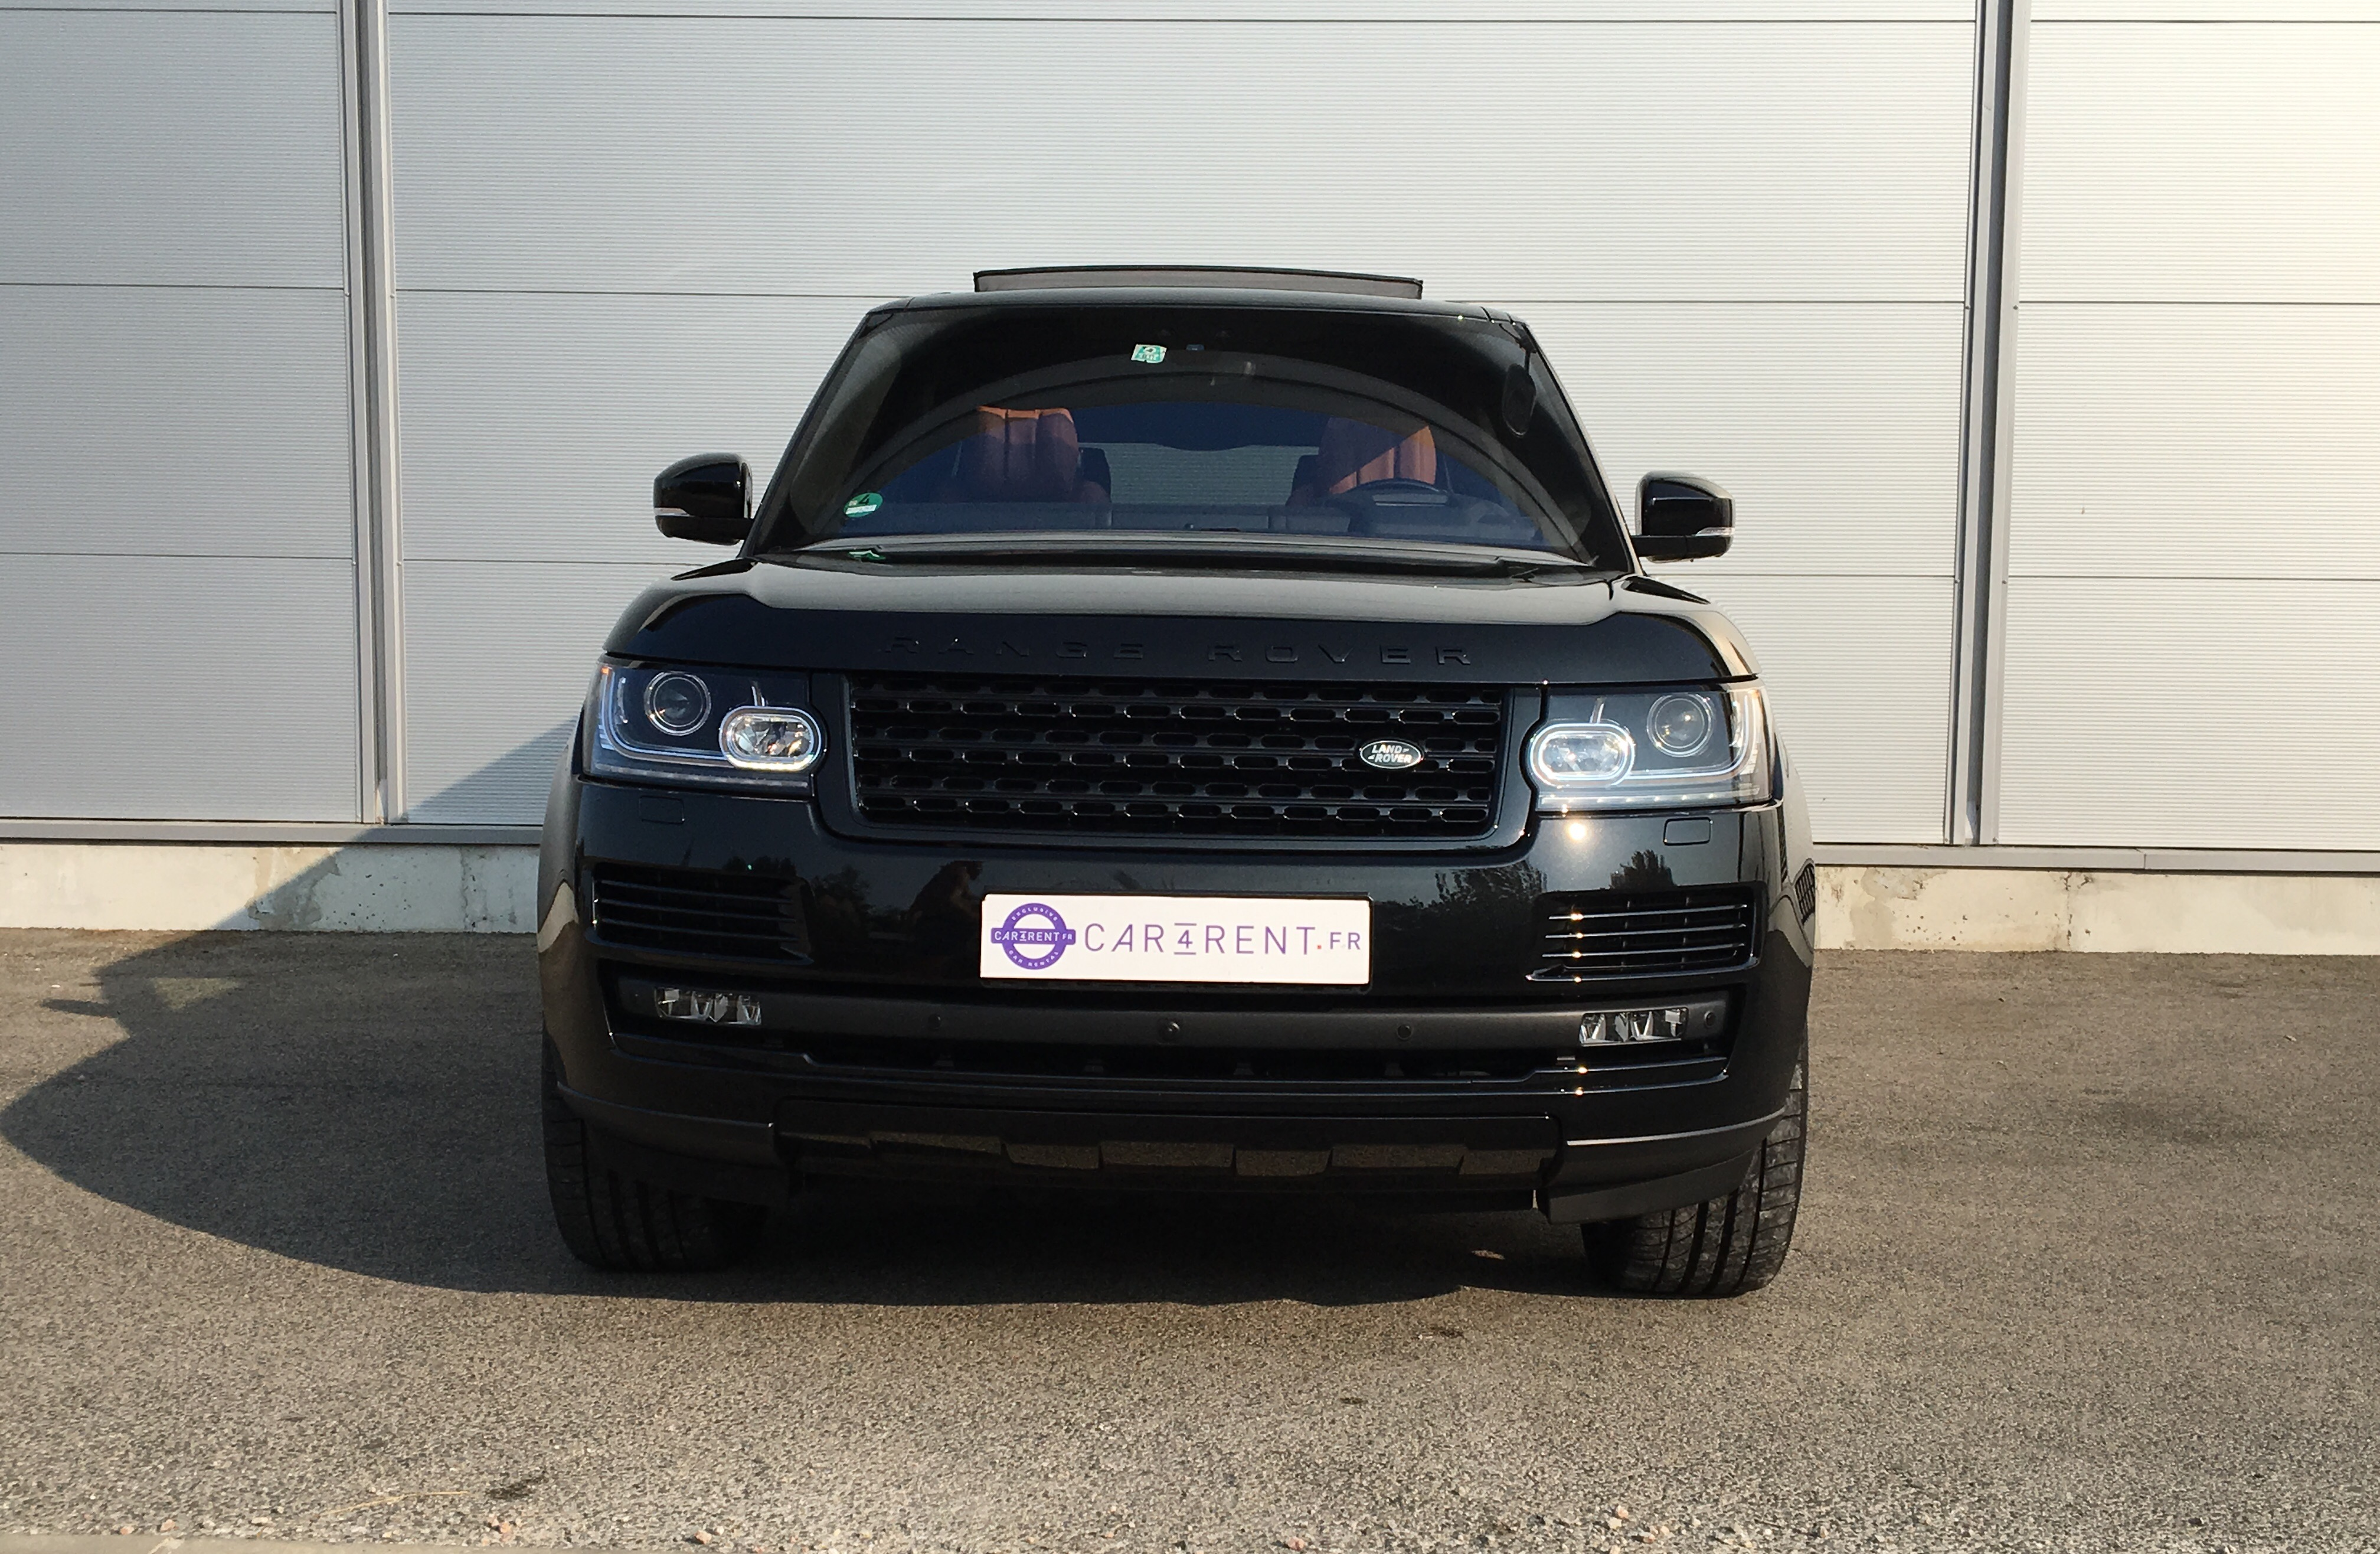 hire premium suv monaco car4rent range rover